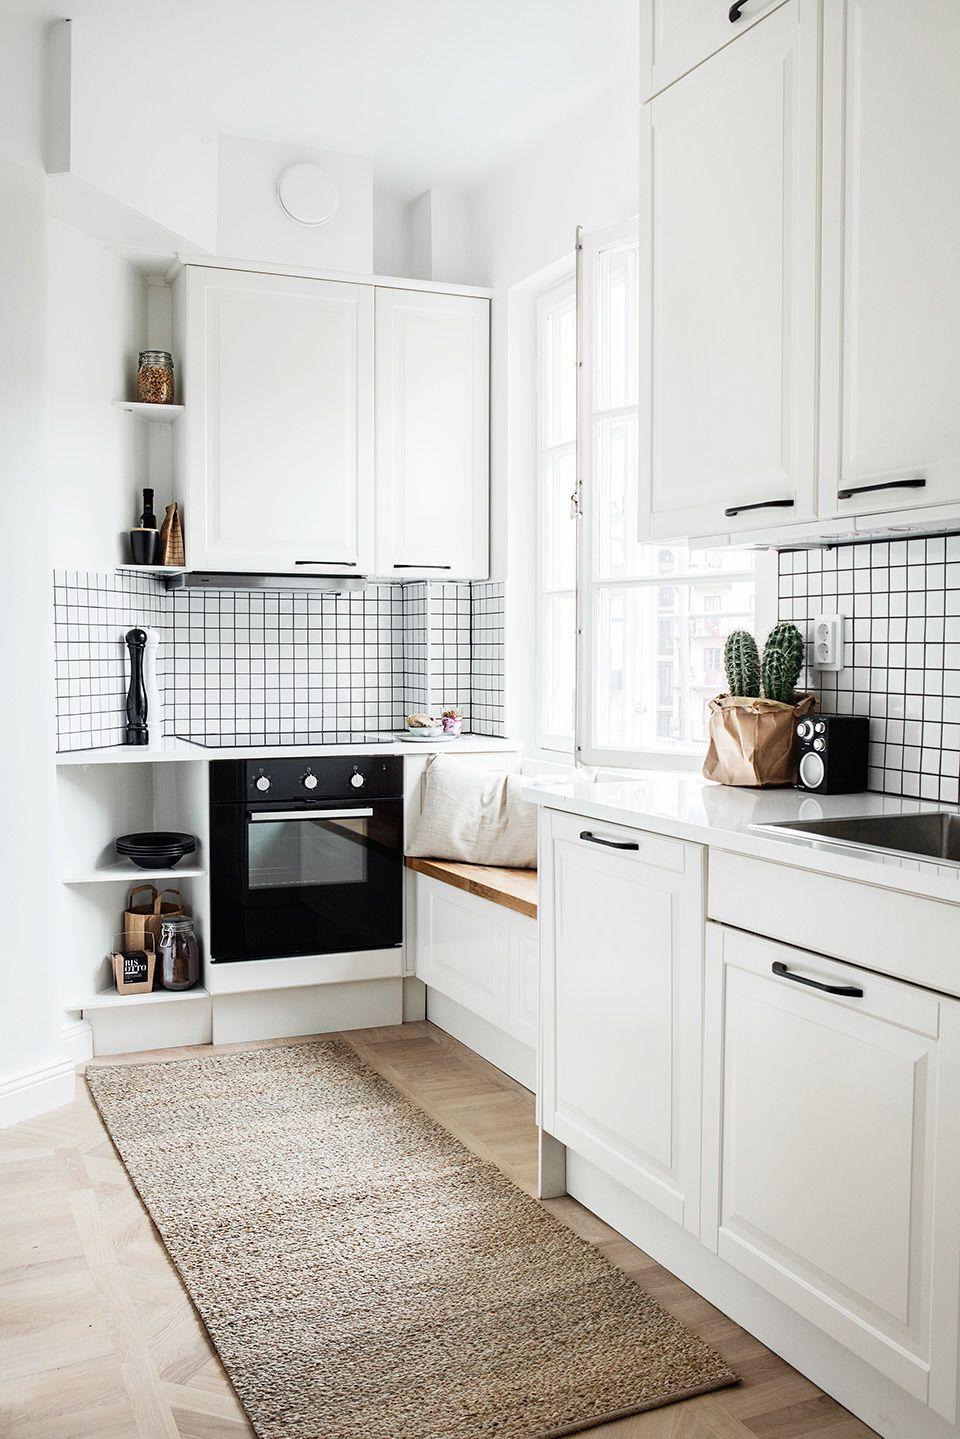 50 Examples Of Beautiful Scandinavian Interior Design | Home Design ...